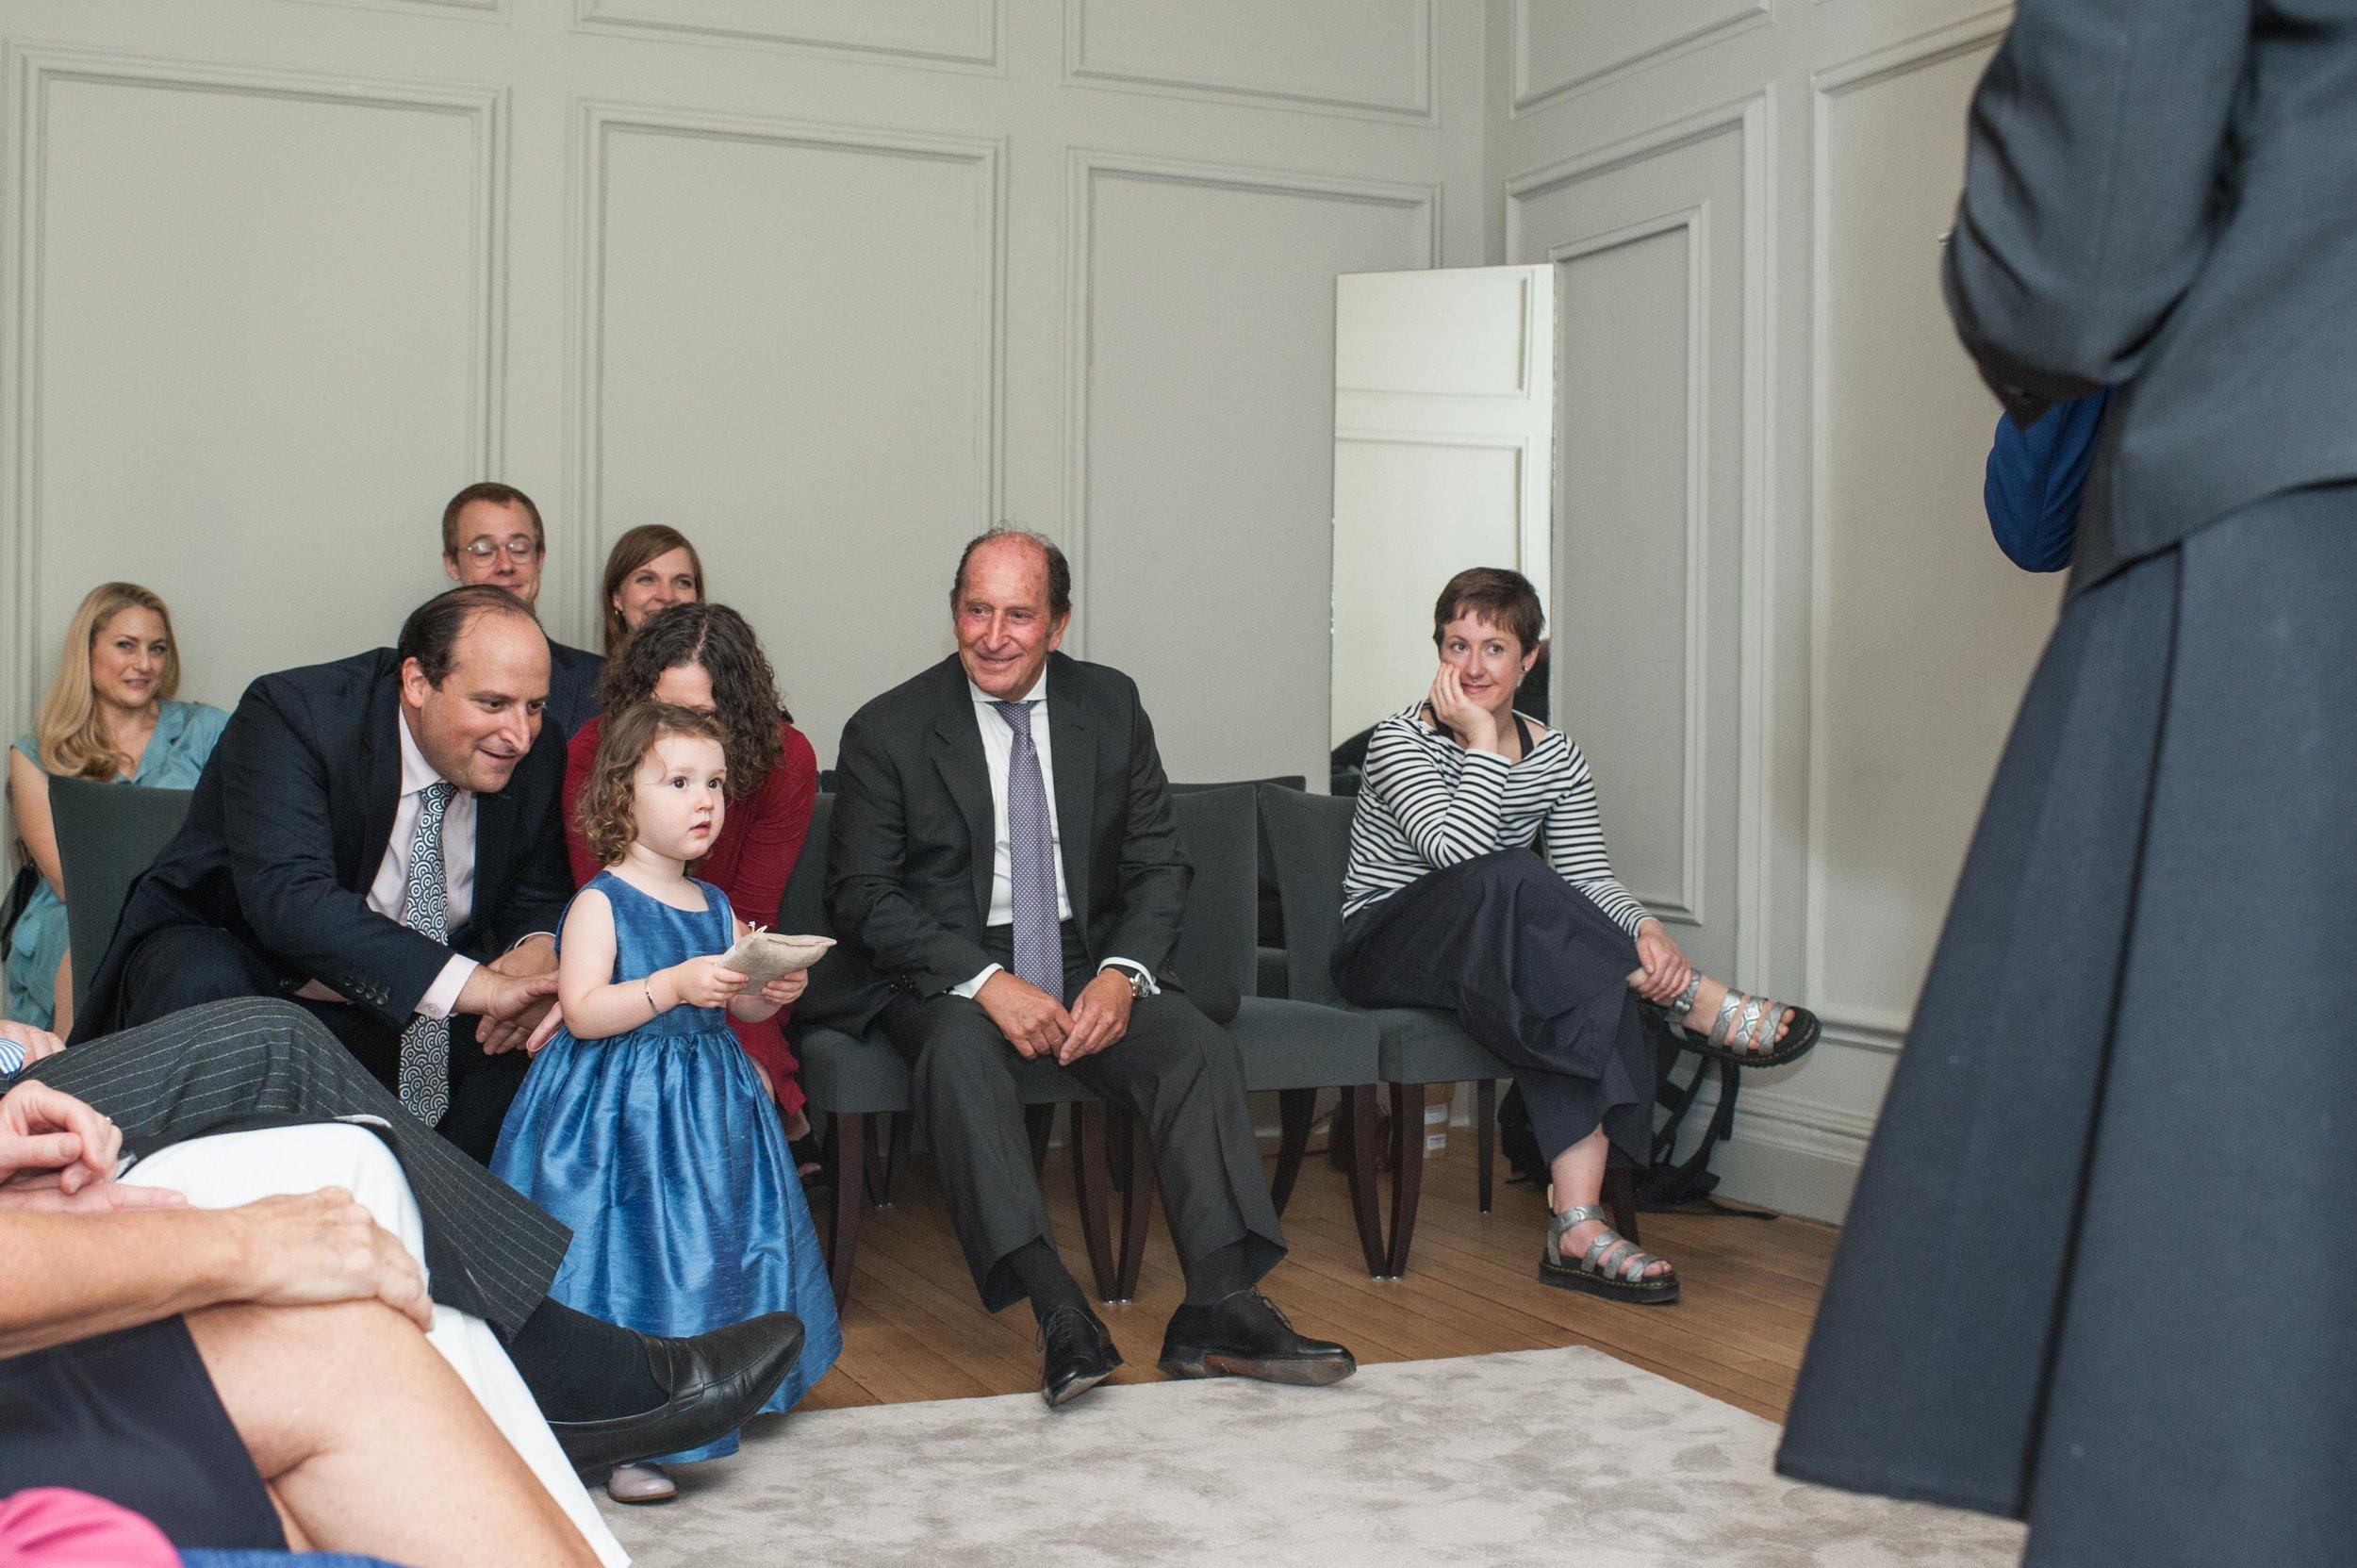 Wedding Photos_Small (119 of 232).jpg